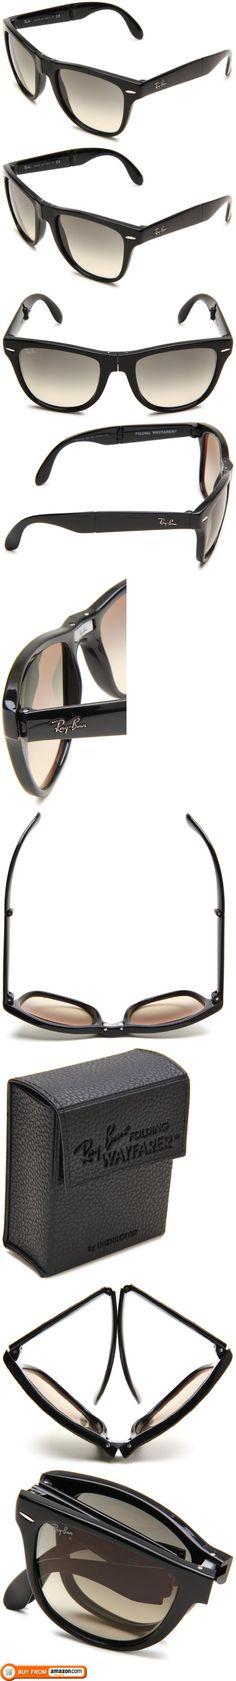 a597bba9fe84 Ray-Ban Folding Square Sunglasses